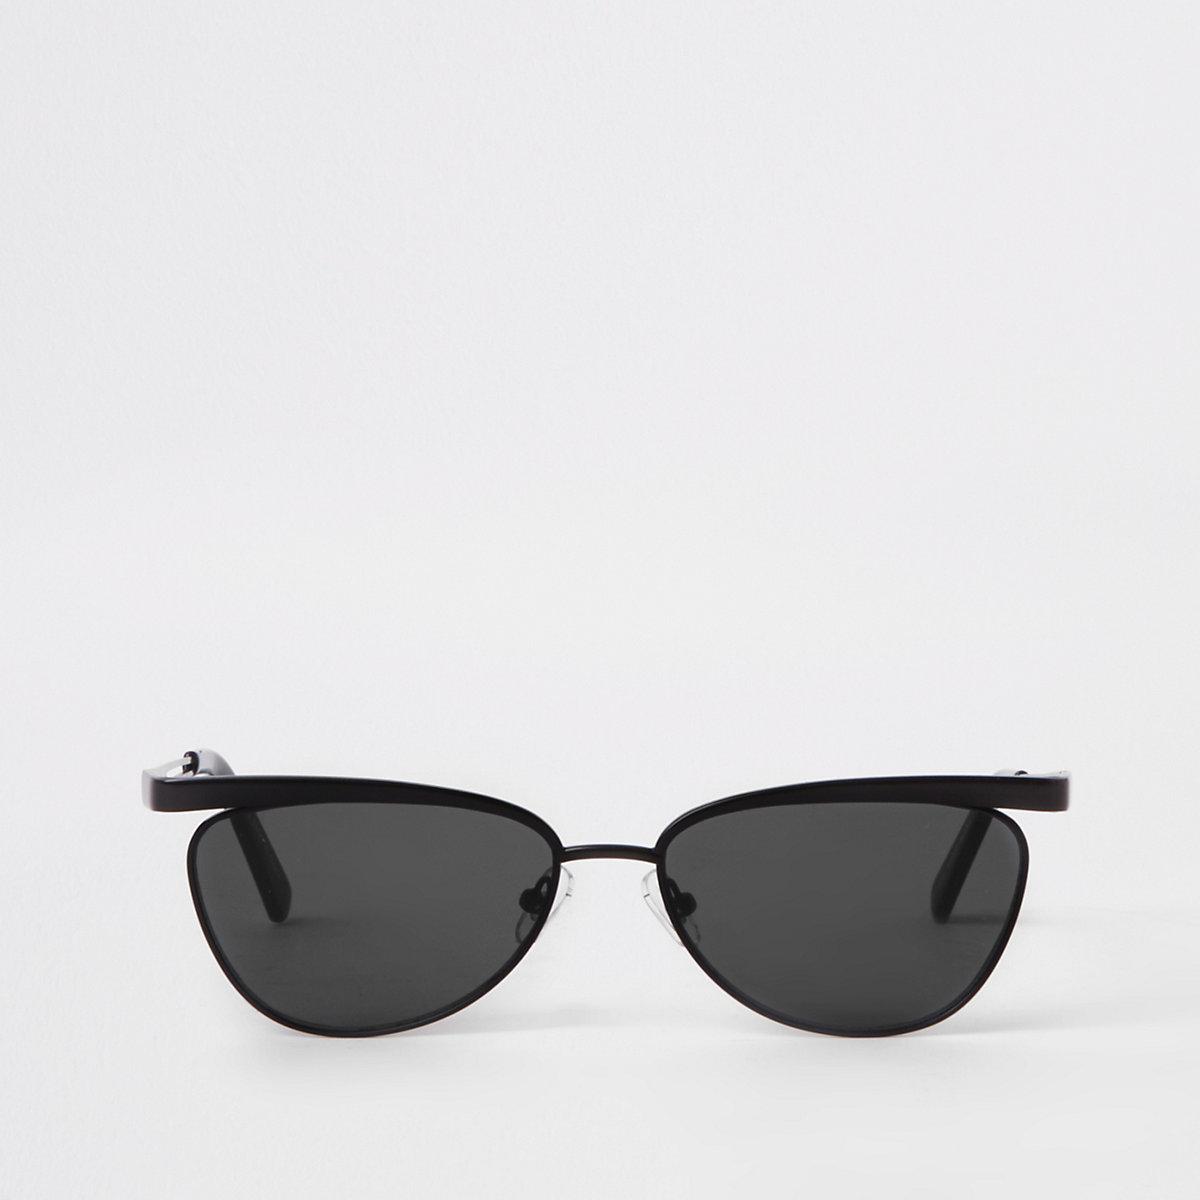 Black smoke lens slim frame sunglasses